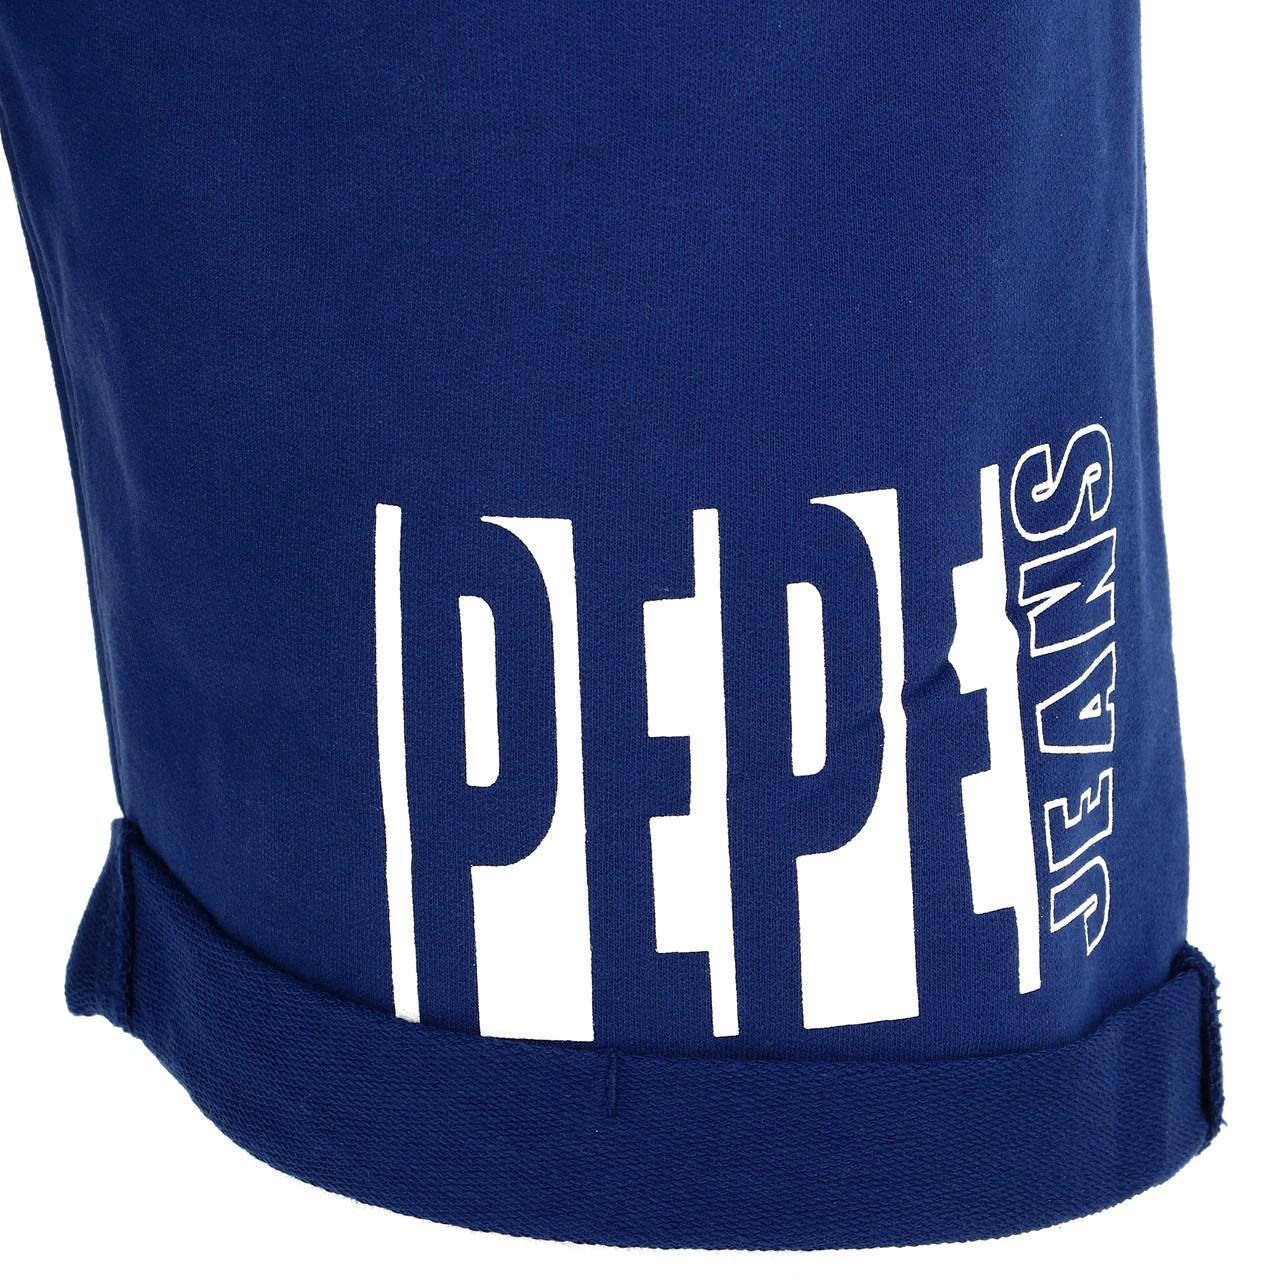 Bermuda-Shorts-Pepe-jeans-Otto-Navy-Shorts-Jr-Blue-17691-New thumbnail 3